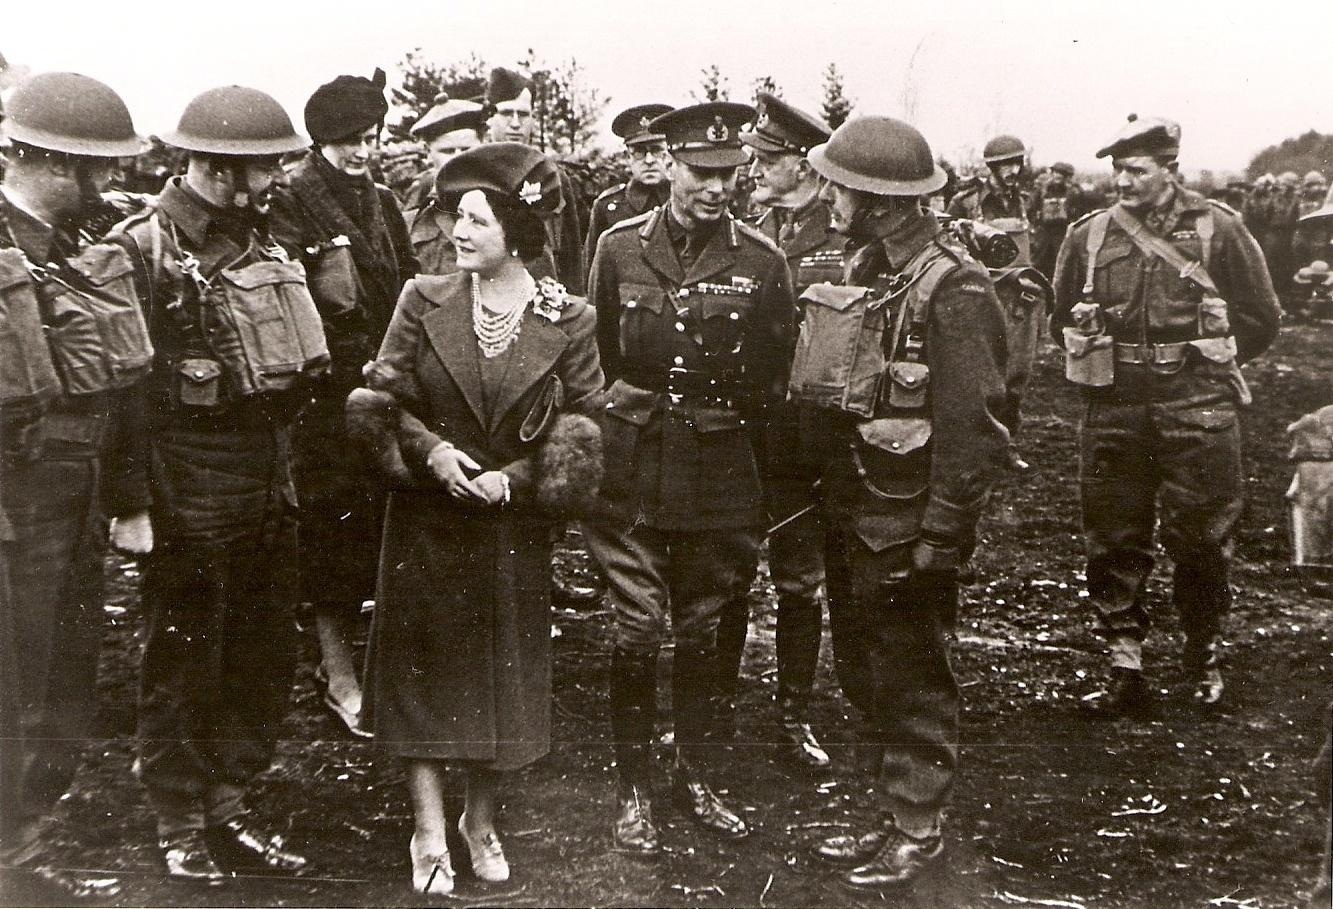 https://0901.nccdn.net/4_2/000/000/017/e75/George-VI----lizabeth--P.Brosseau-England--1942-2-1333x909.jpg